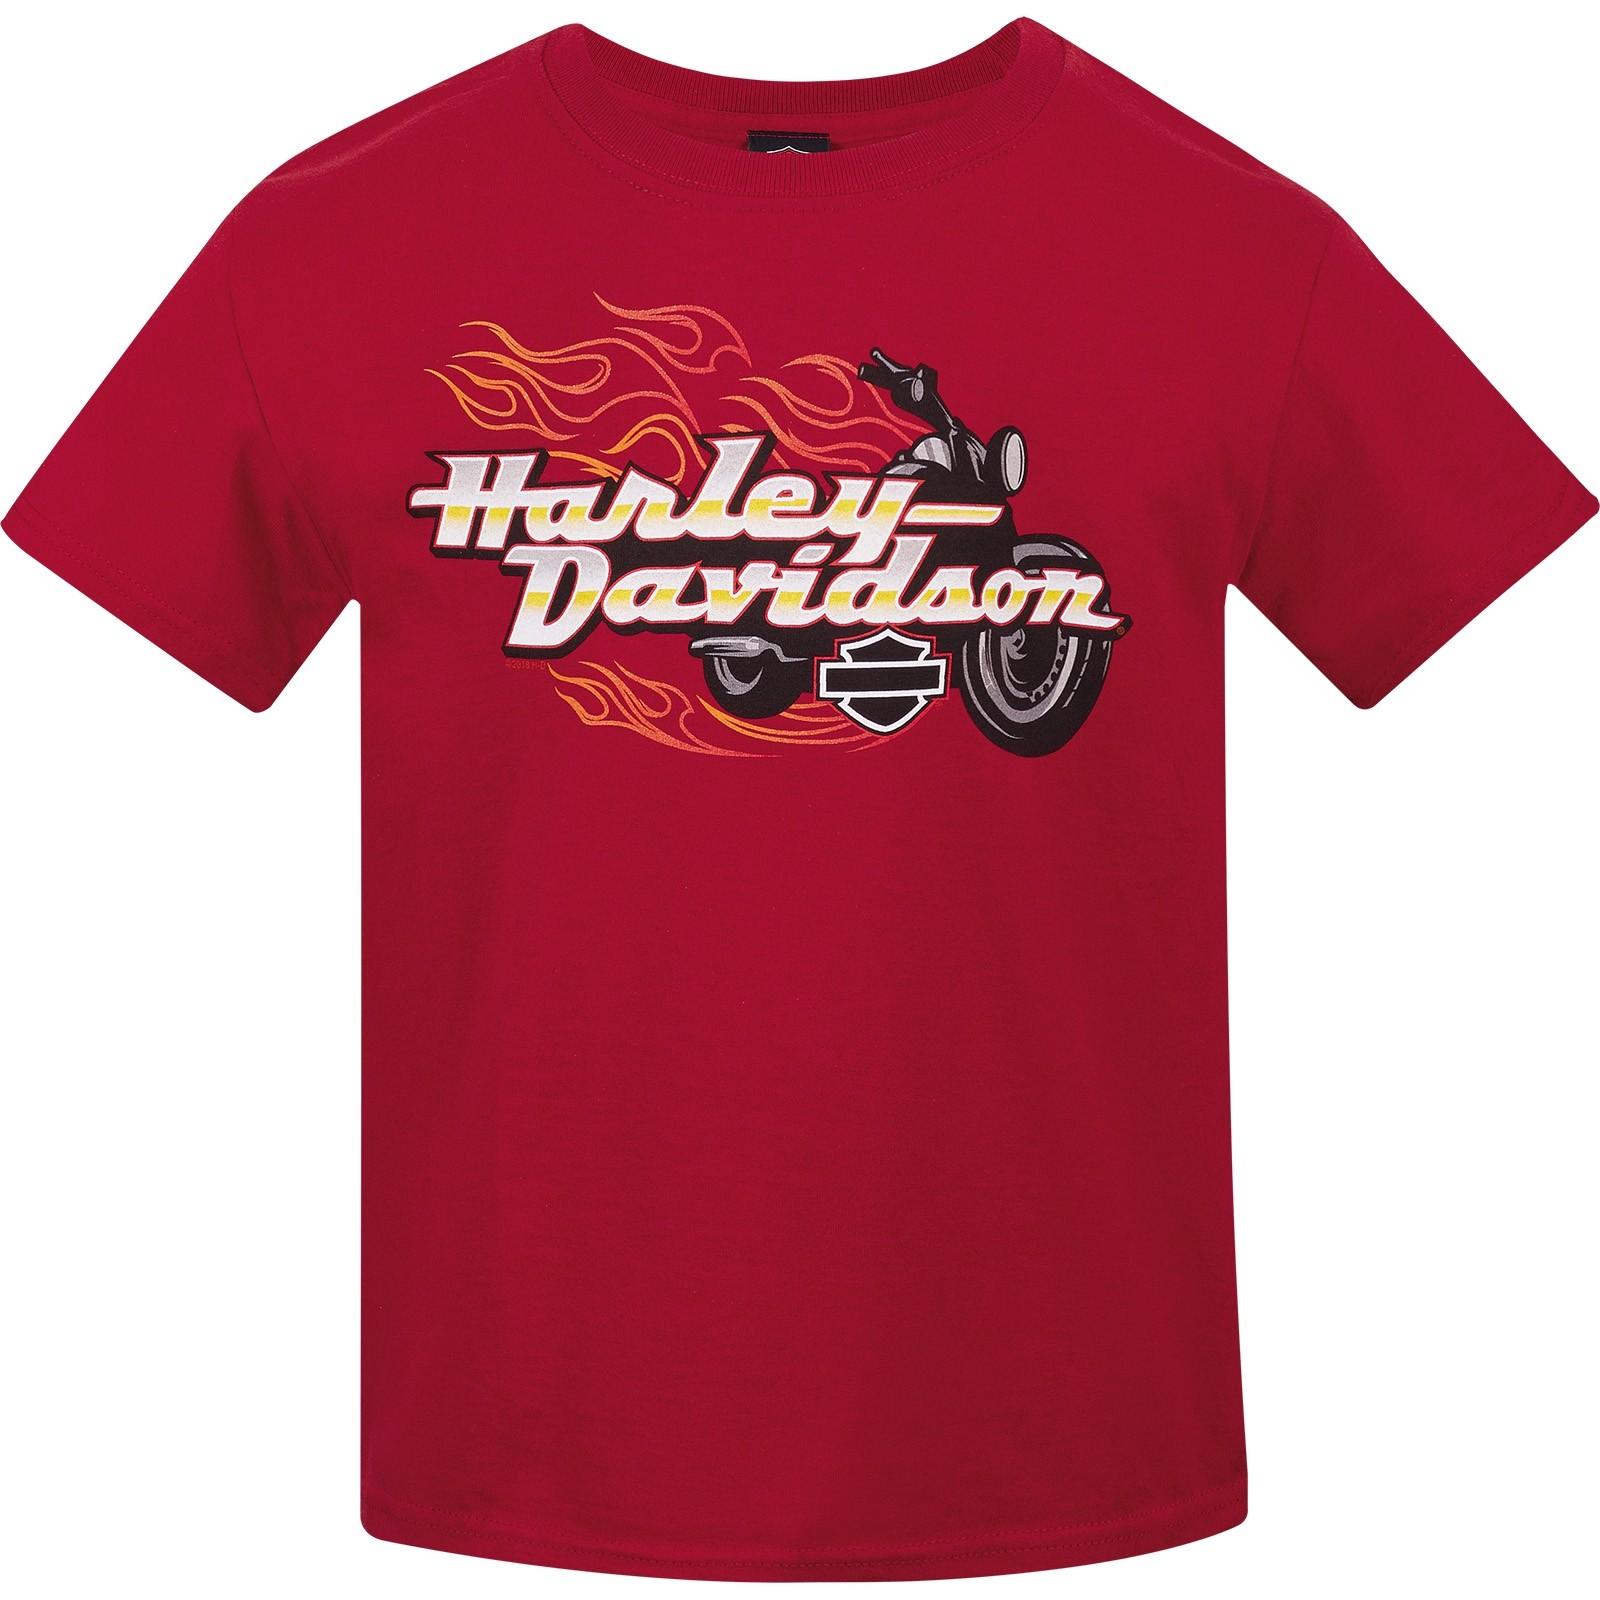 Harley-Davidson Kids/Youth Crew Neck T-Shirt - USAG Wiesbaden | Bike Blaze